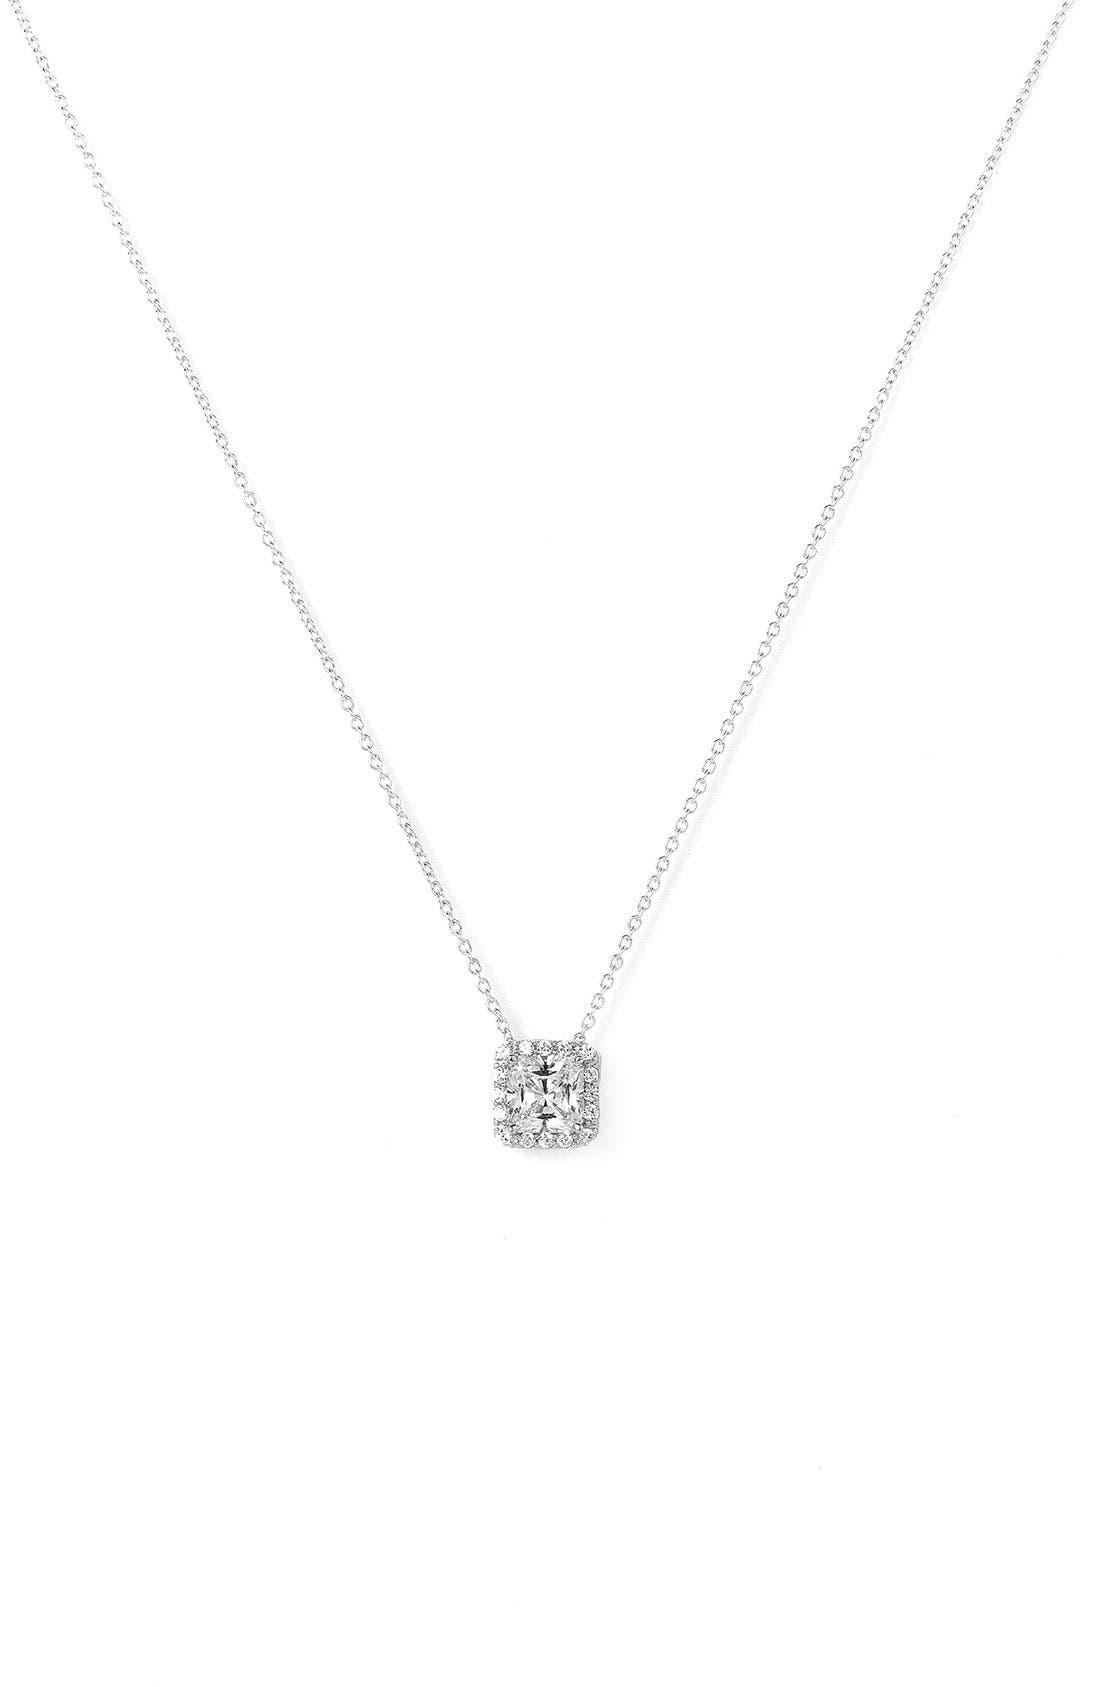 Alternate Image 1 Selected - Nordstrom Princess Cut Pavé Pendant Necklace